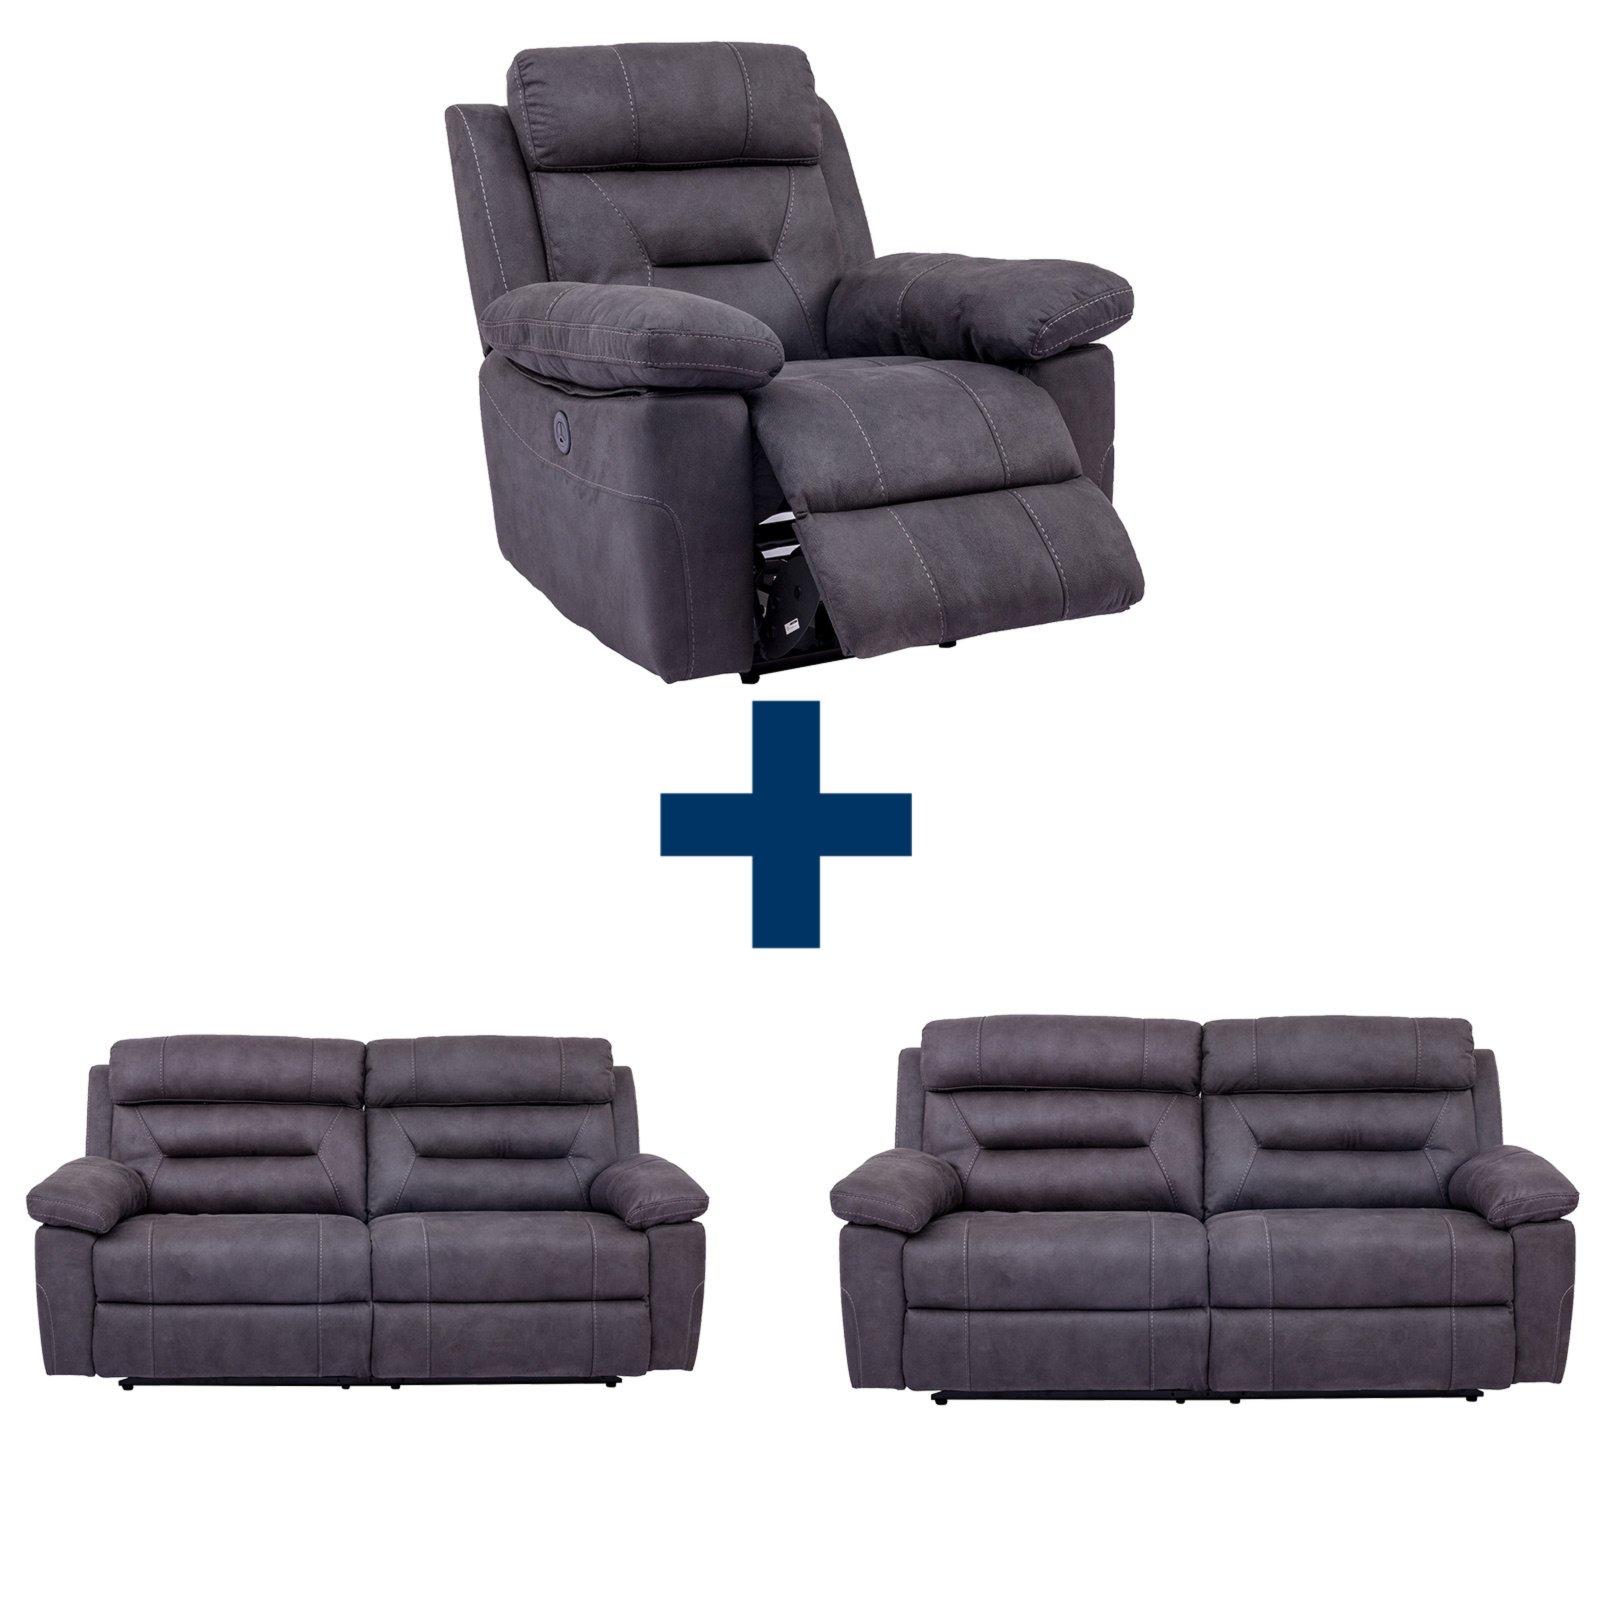 Set TARANTELLA 2 Sofas mit Sessel mit Relaxfunktion